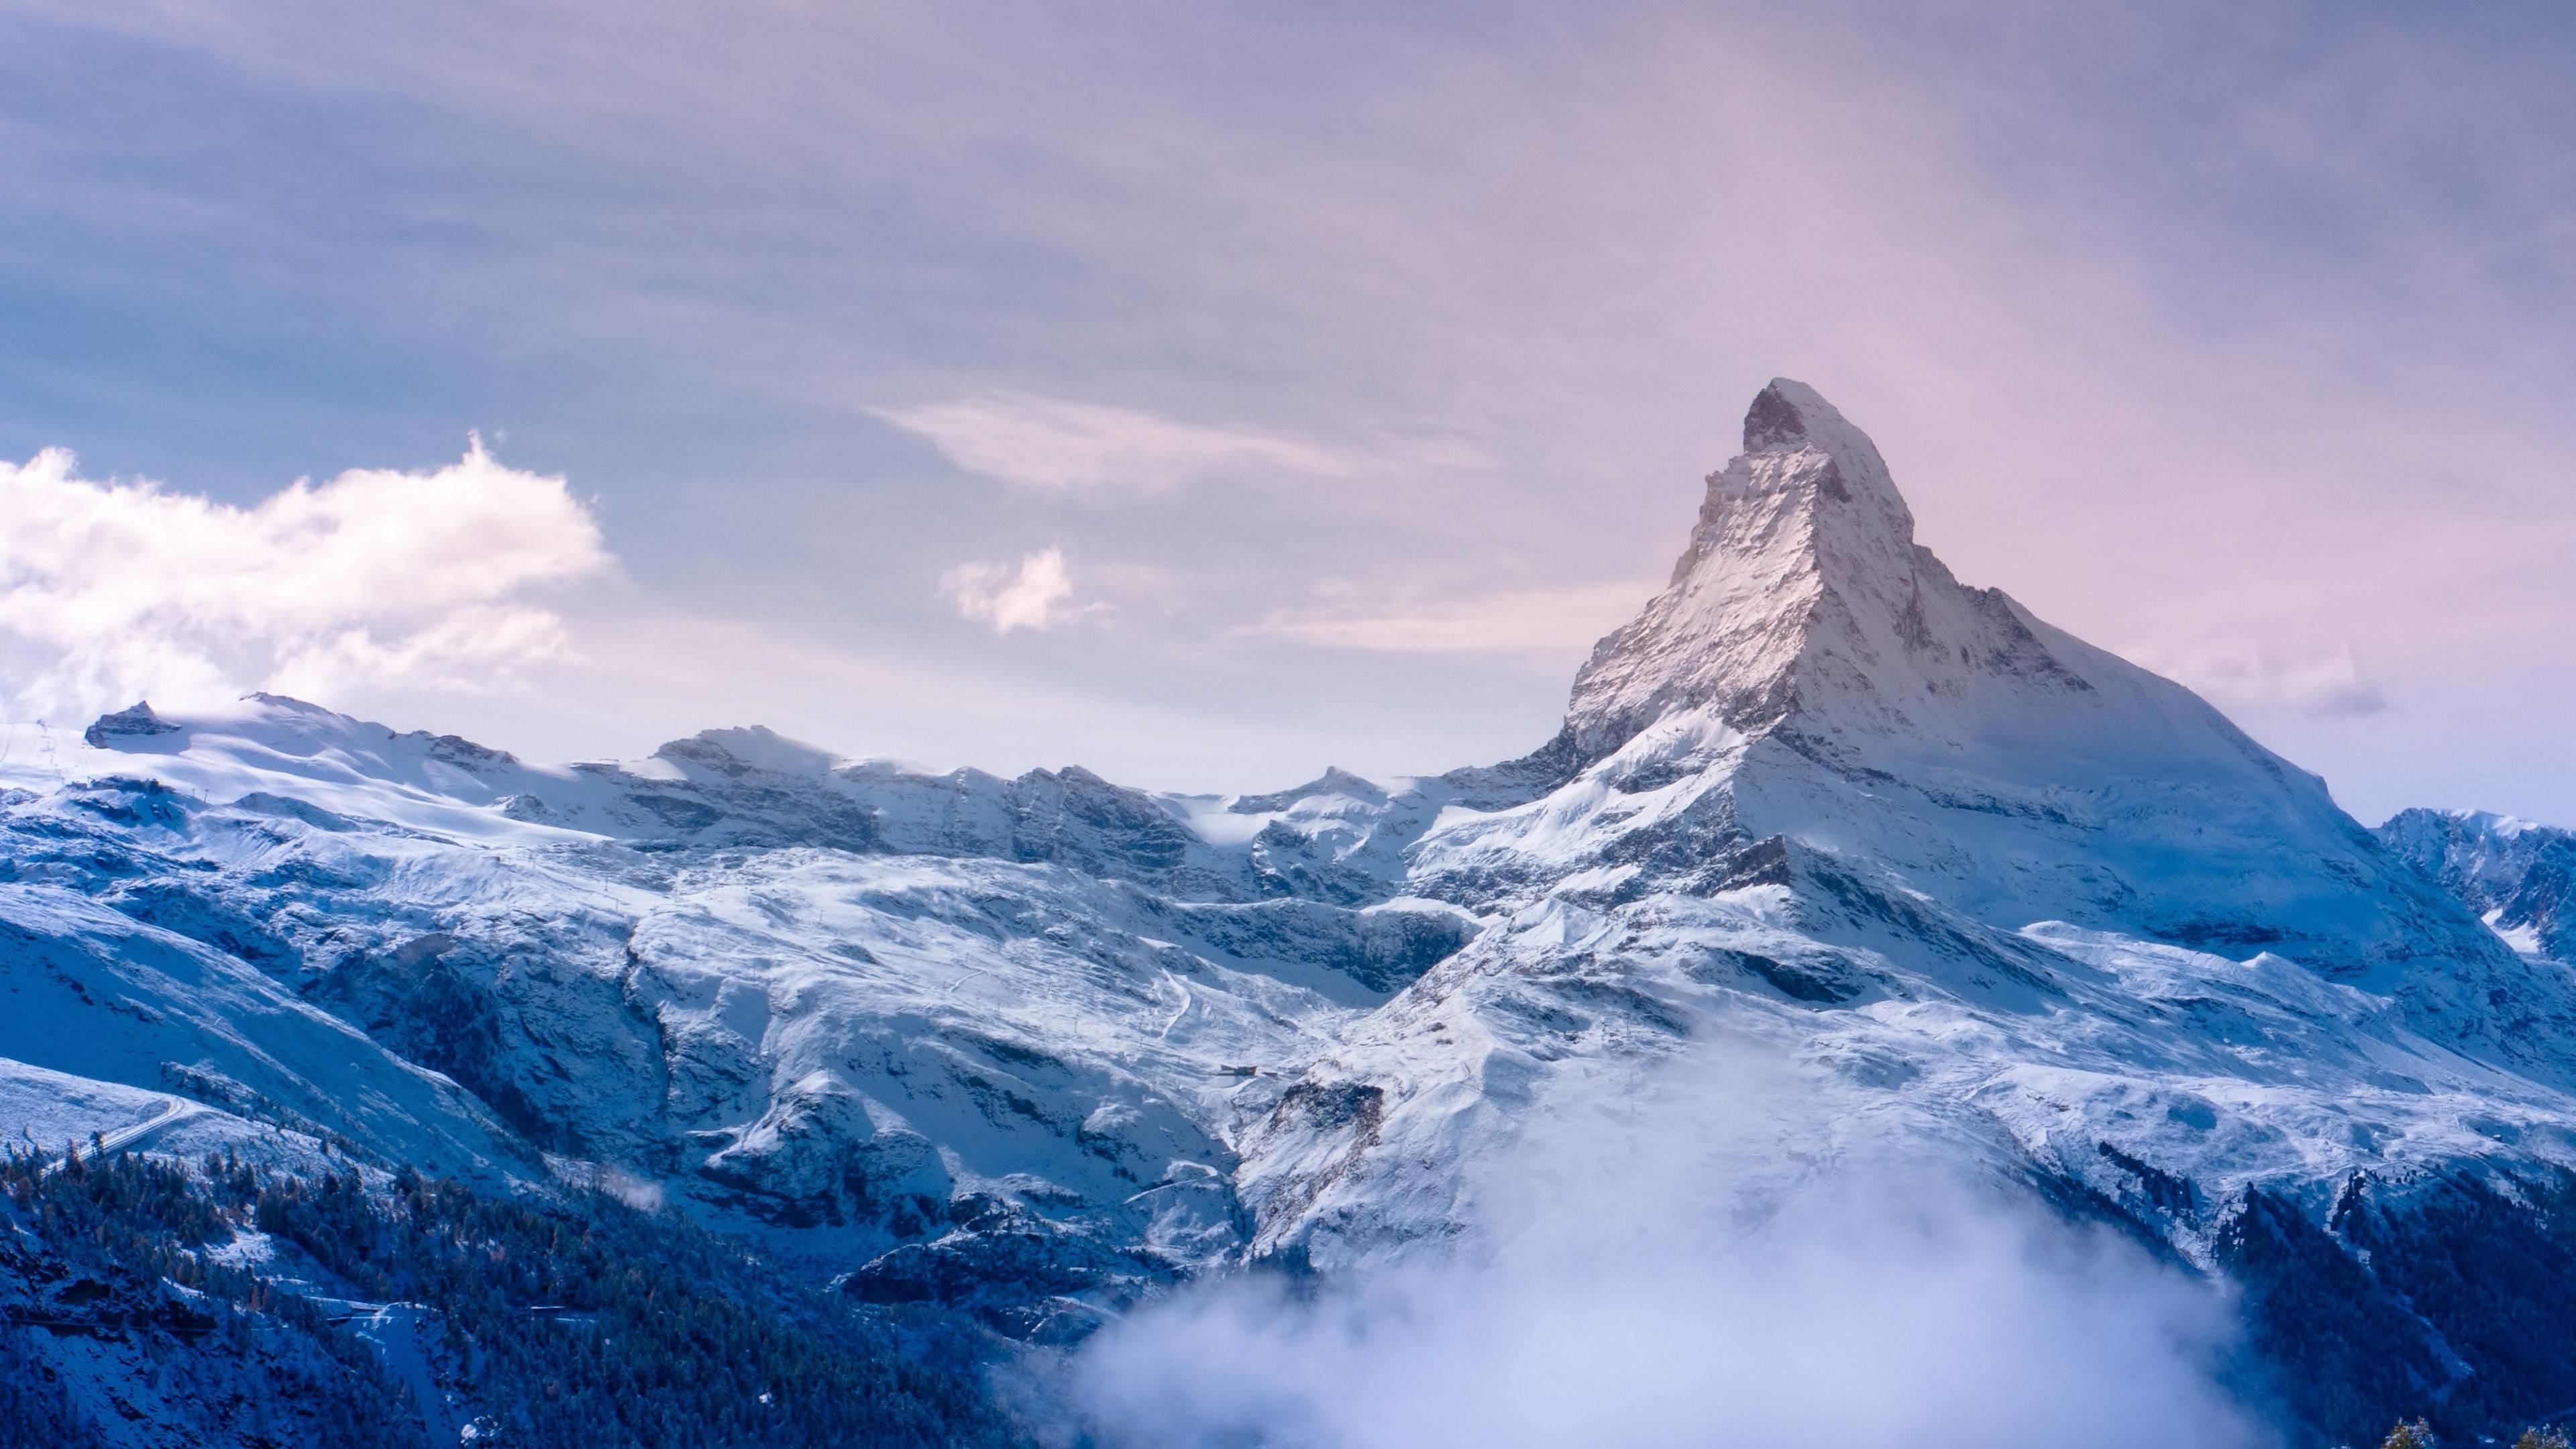 Winter Mountain Desktop Wallpaper 84 Images